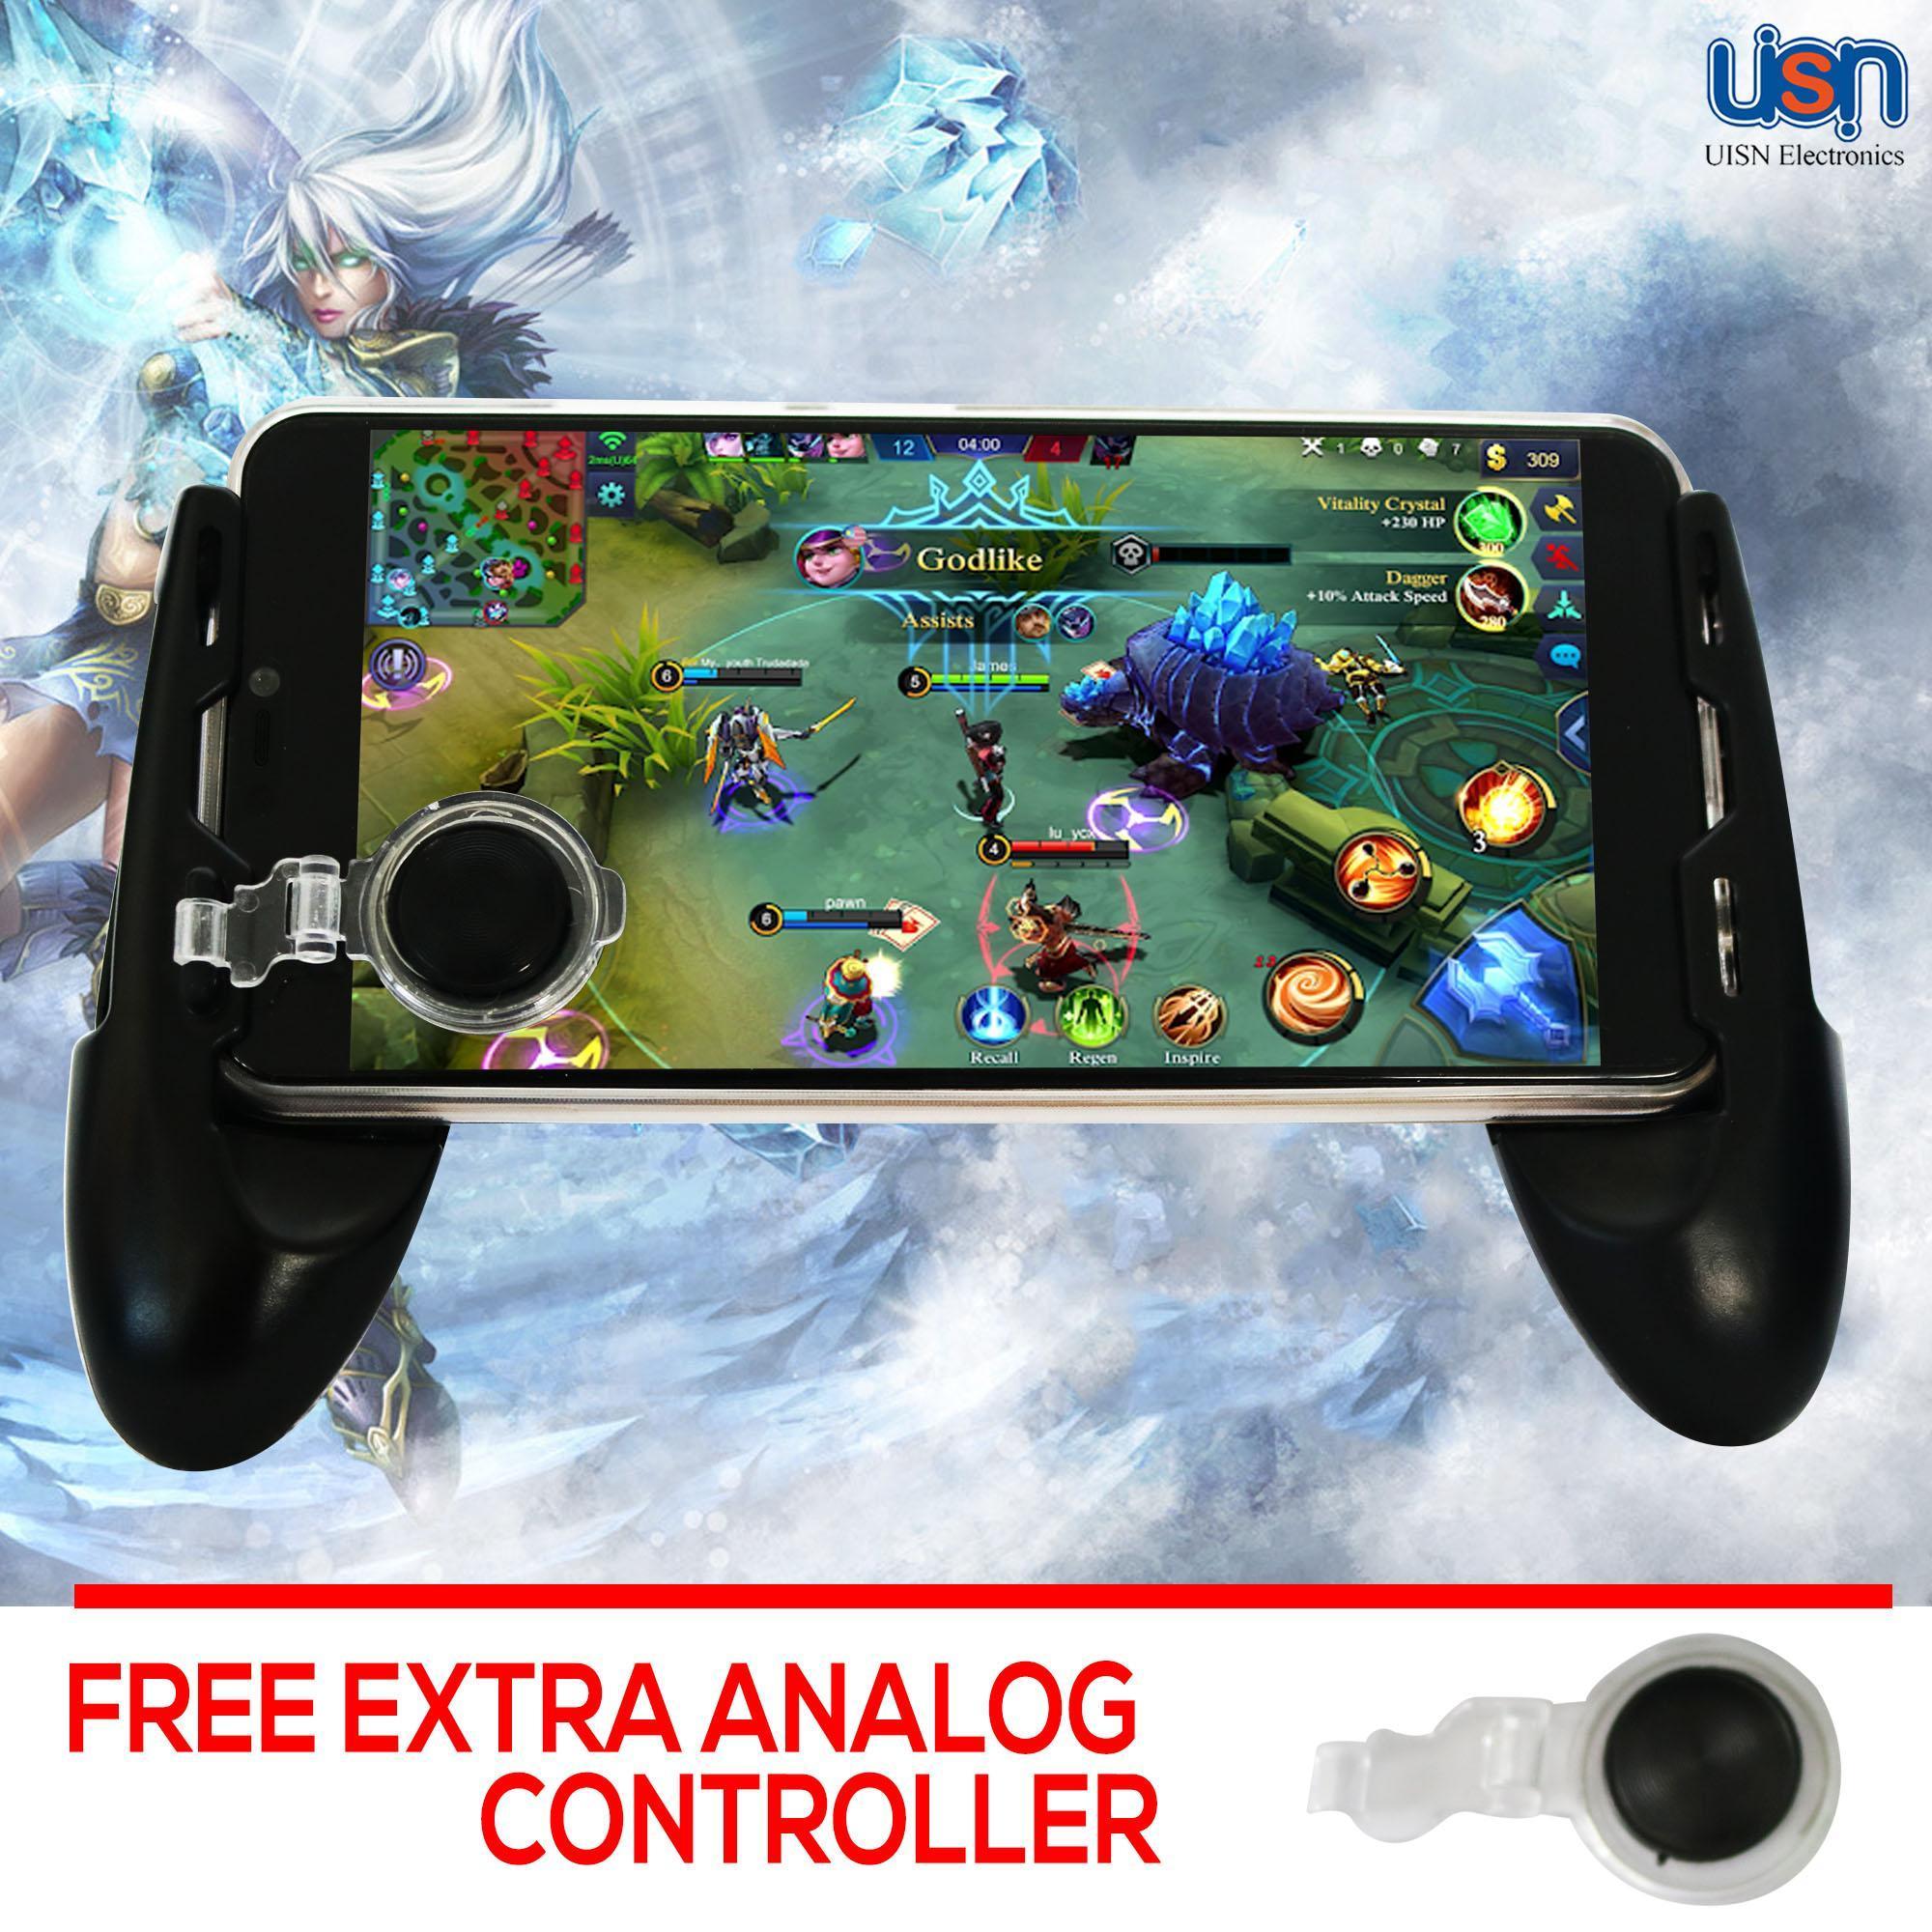 Gamepad JL01 Game Joystick Grip Extended Handle Game Controller Mobile 201f2704c8